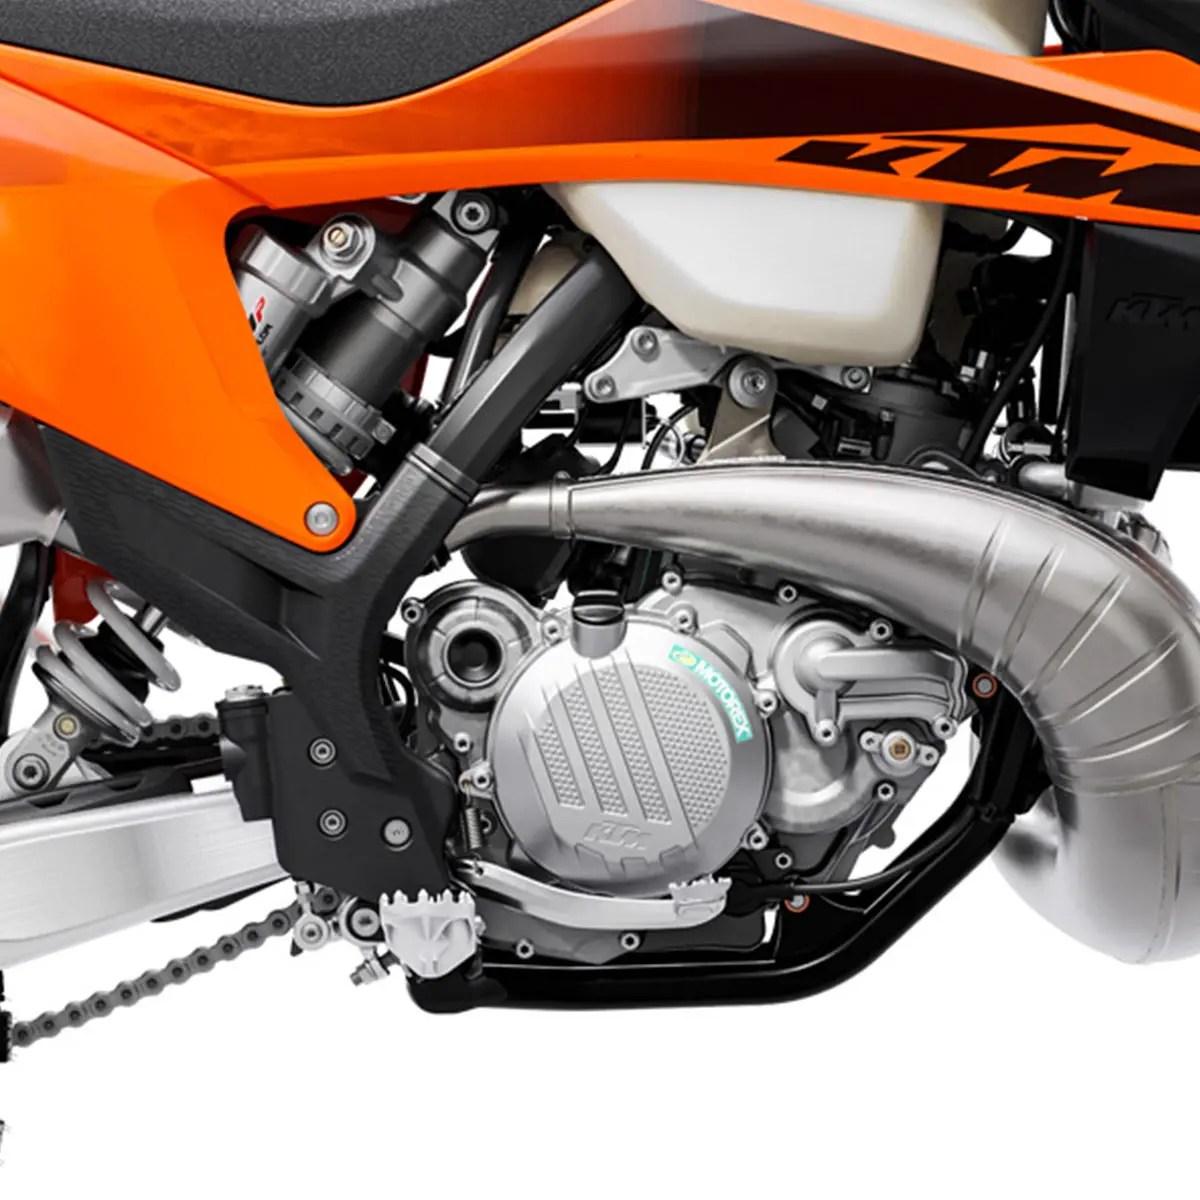 CADRE-KTM-300-EXC-TPI-2020